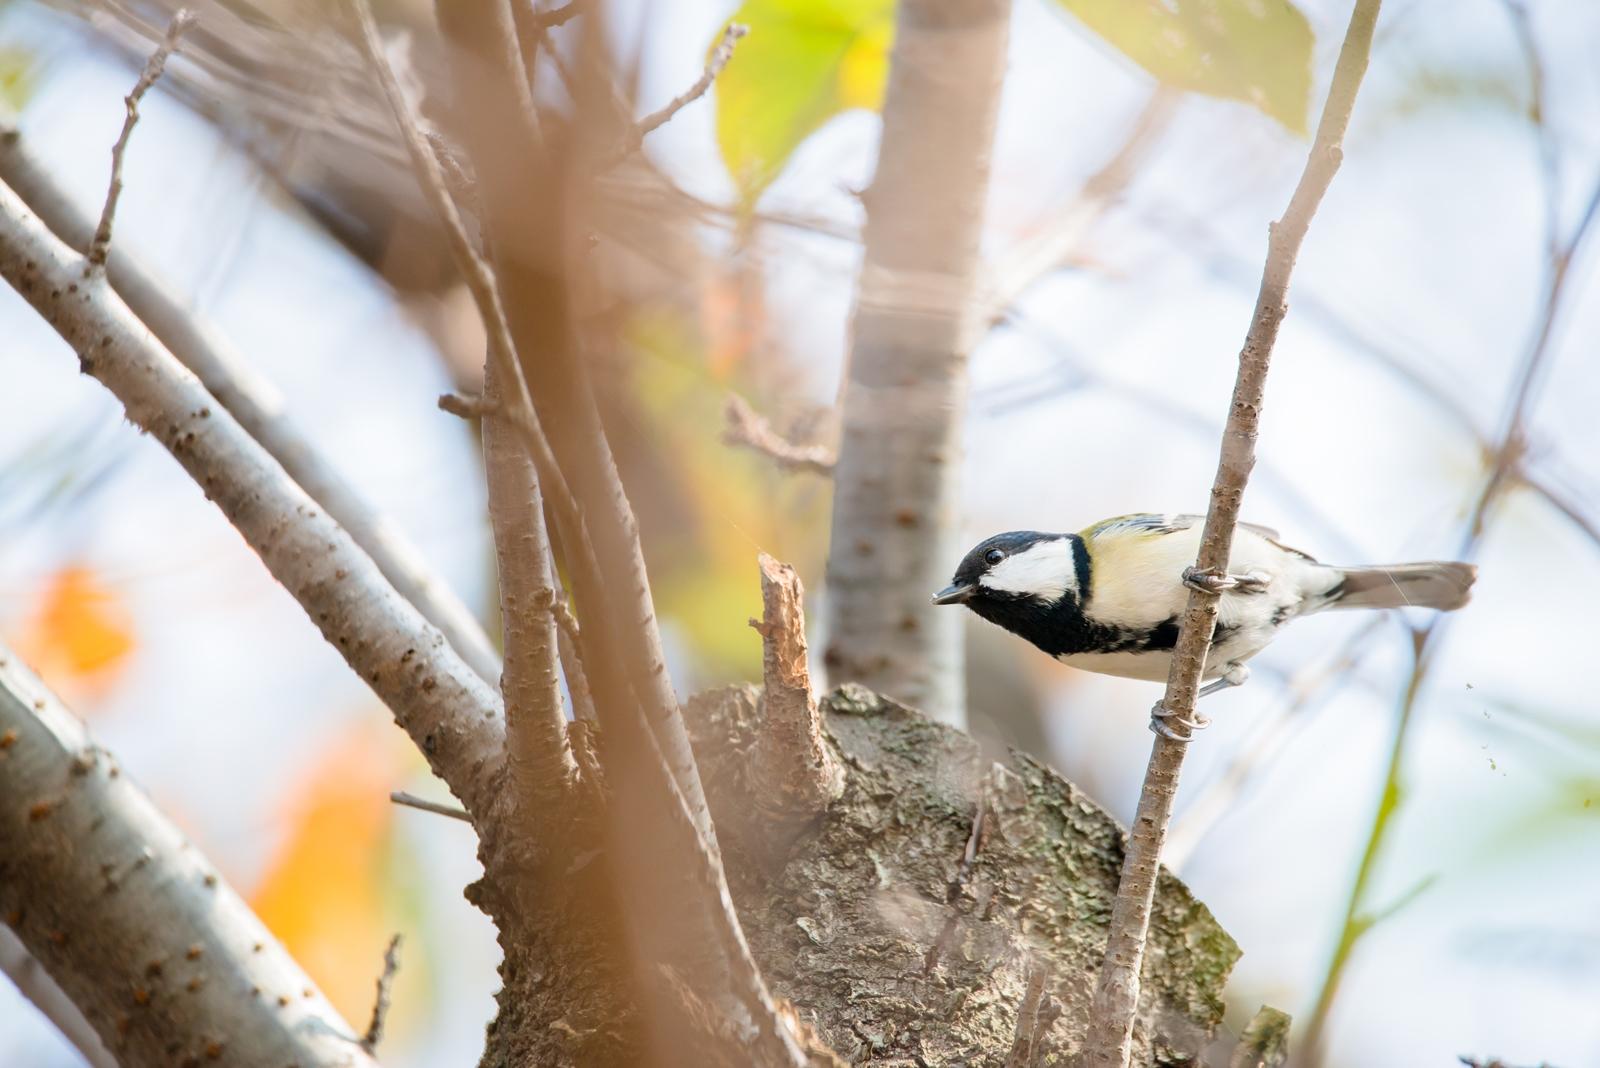 Photo: 秋を駆け抜ける Runs through the autumn.  徐々に視界が広がる 先を見通し 駆け抜ける 次の枝へ次の枝へと  Japanese Tit. (シジュウカラ)  #birdphotography #birds #cooljapan #kawaii #nikon #sigma  Nikon D800E SIGMA 150-600mm F5-6.3 DG OS HSM Contemporary  大塩貴文 写真展『まなざし』 2015年11月20日[金]-29日[日] < http://islandgallery.jp/12134 >